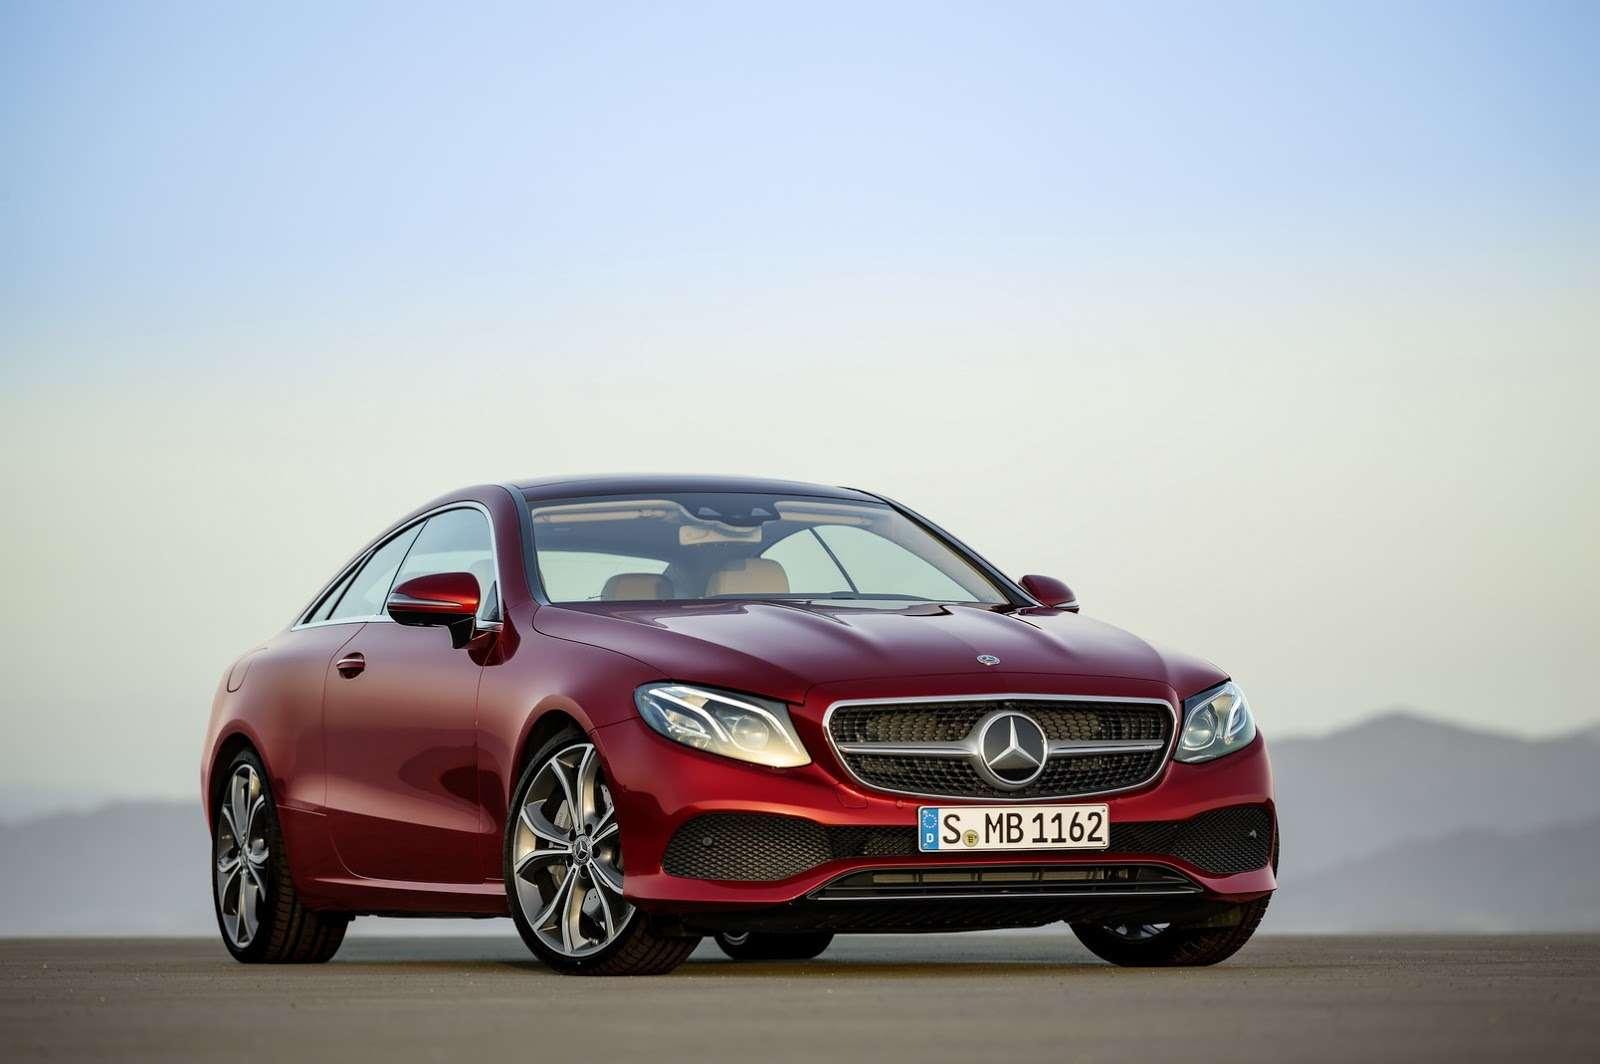 Больше илучше: Mercedes-Benz представил новое купе E-класса— фото 678182